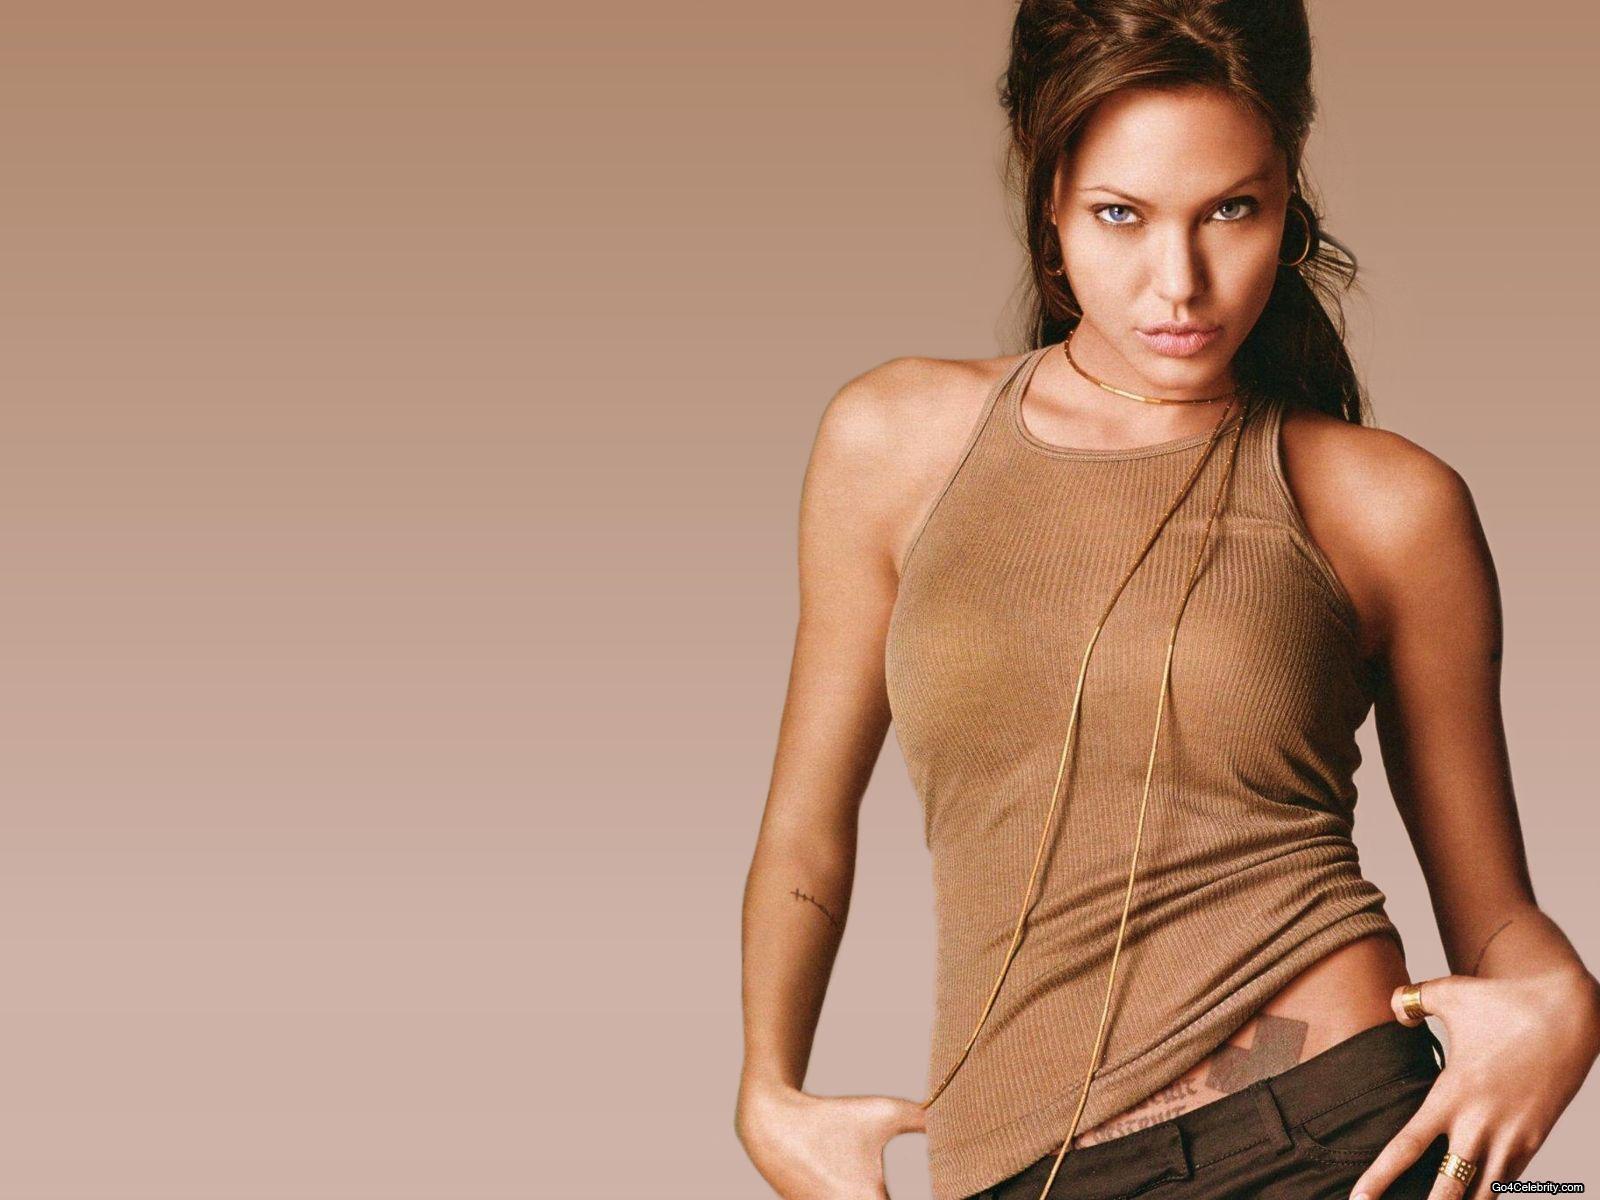 Angelina Jolie Sex sexy images - angelina jolie wallpaper (2701363) - fanpop